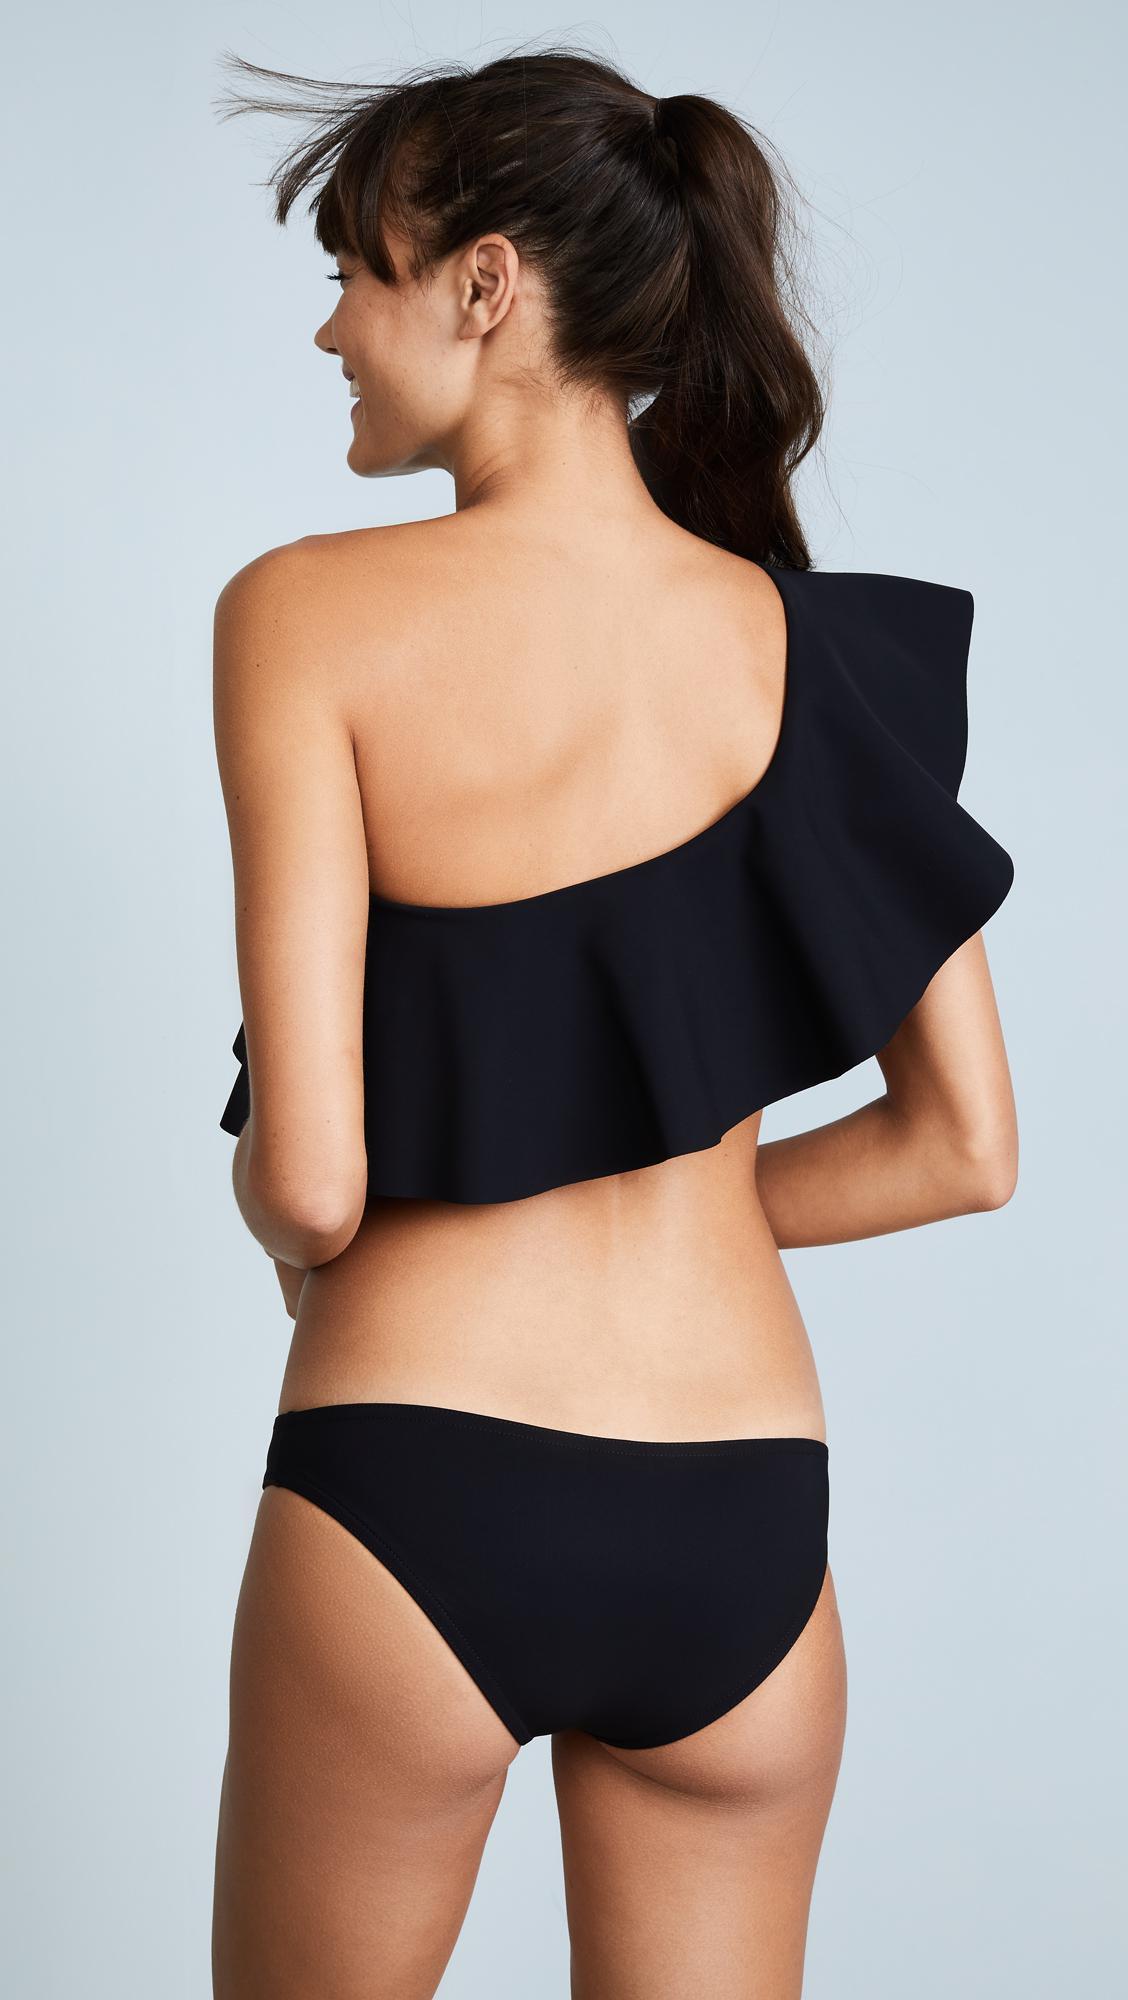 Geniue Stockist For Sale Buy Online Cheap Zaha halterneck bikini top Karla Colletto UJbFILwG